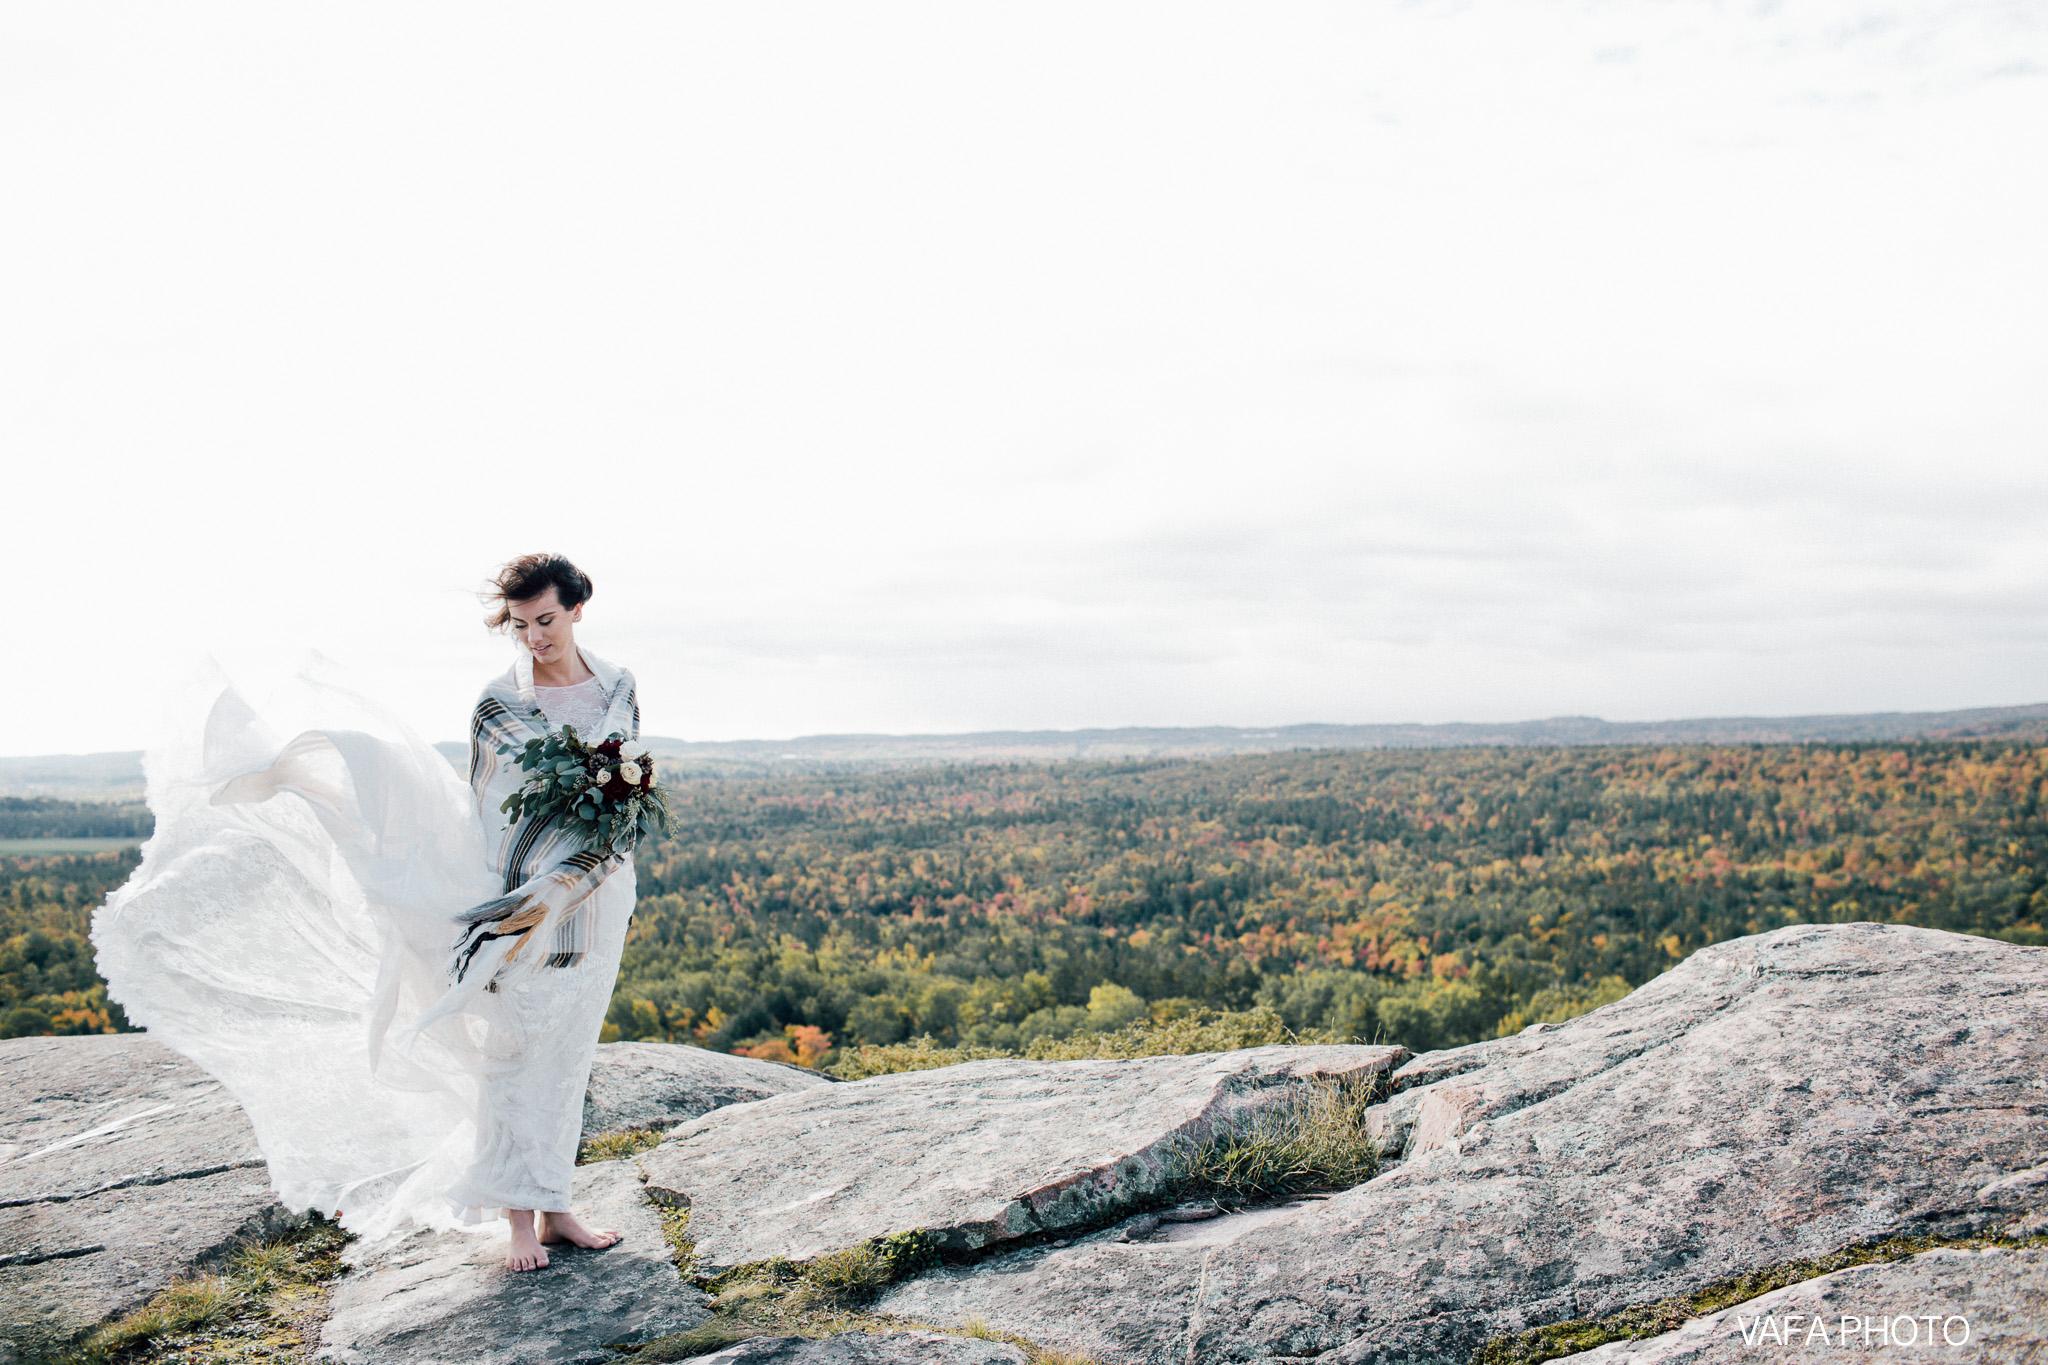 Hogback-Mountain-Wedding-Chelsea-Josh-Vafa-Photo-374.jpg